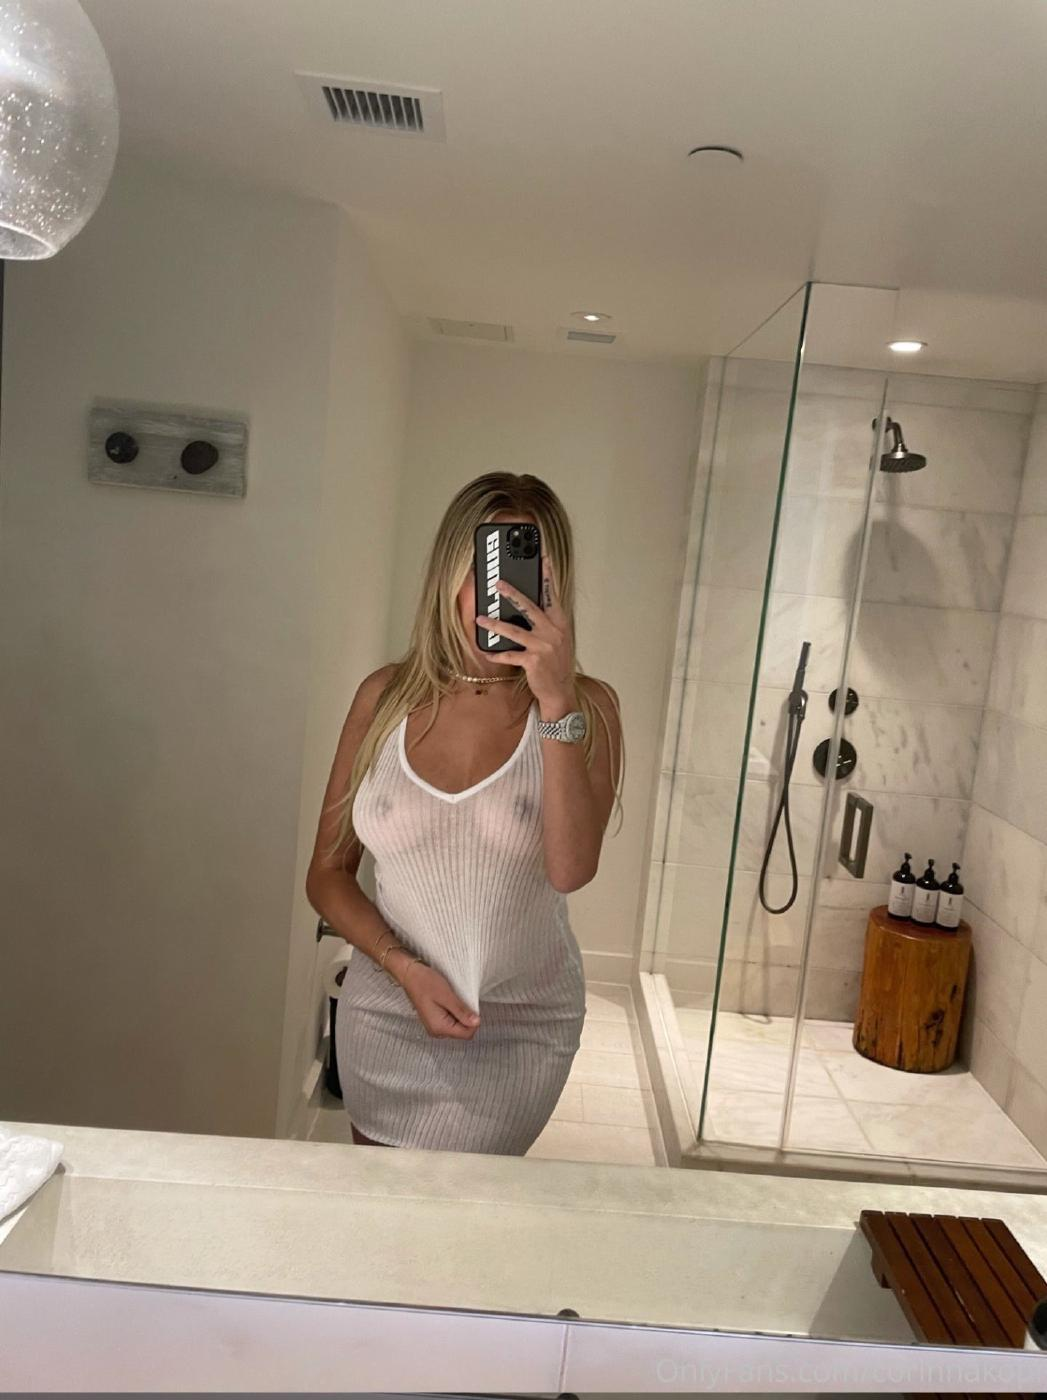 Corinna Kopf Topless Onlyfans Leaked Xouusx